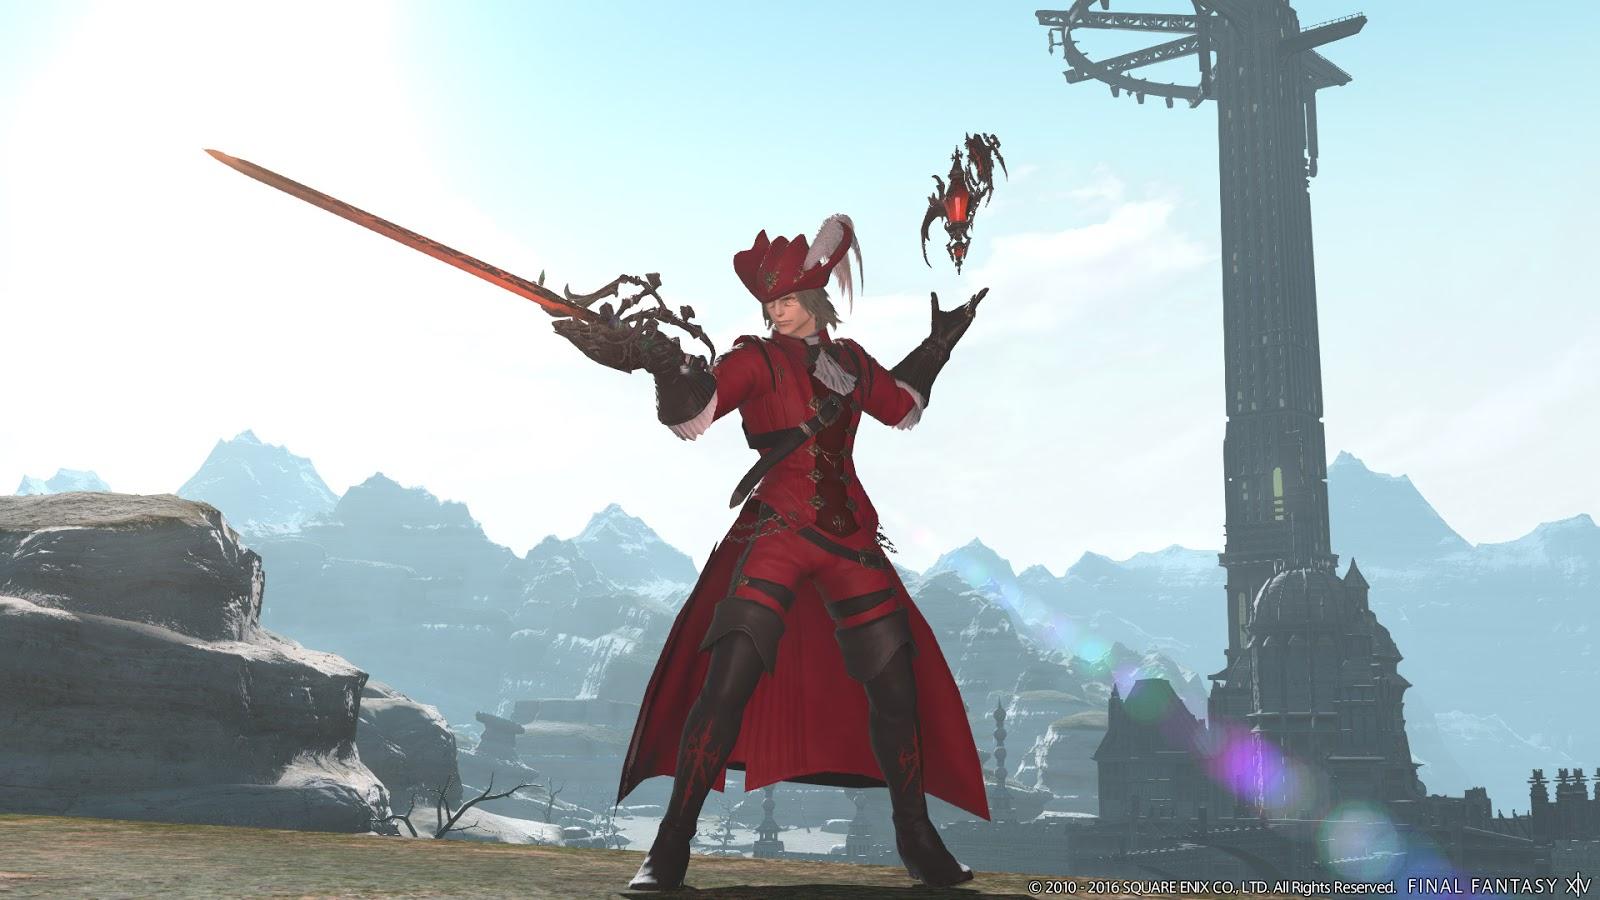 FINAL FANTASY XIV: Stormblood - Impulse Gamer